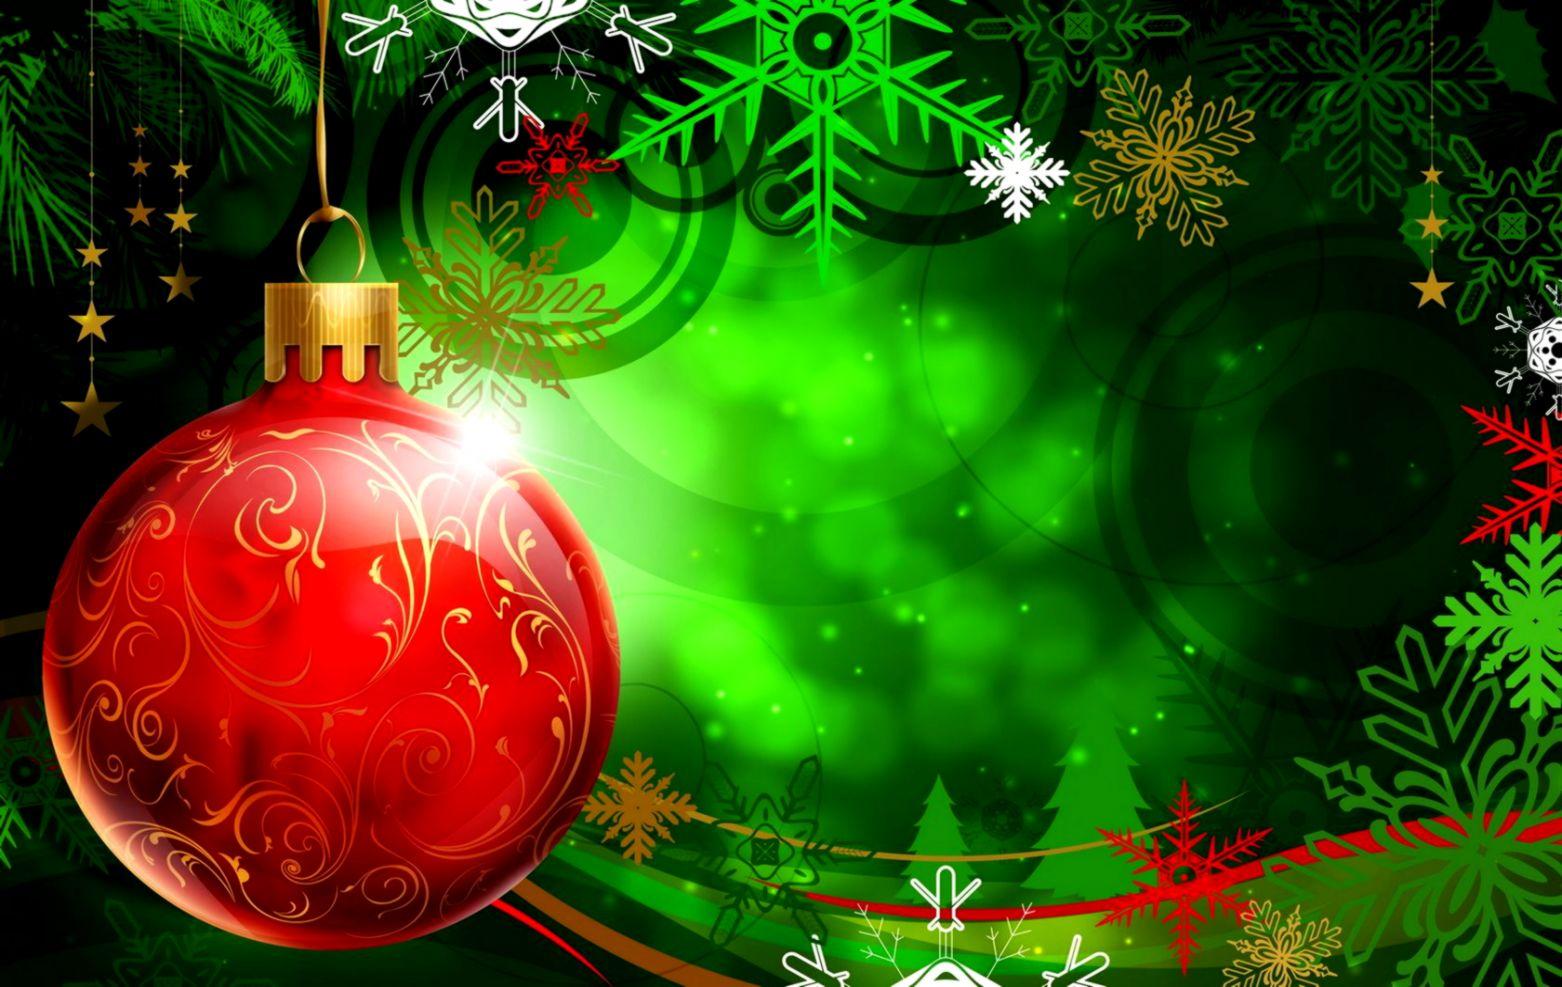 Free Christmas Wallpaper Downloads.Free Christmas Wallpaper Hd Wallpapers Savage